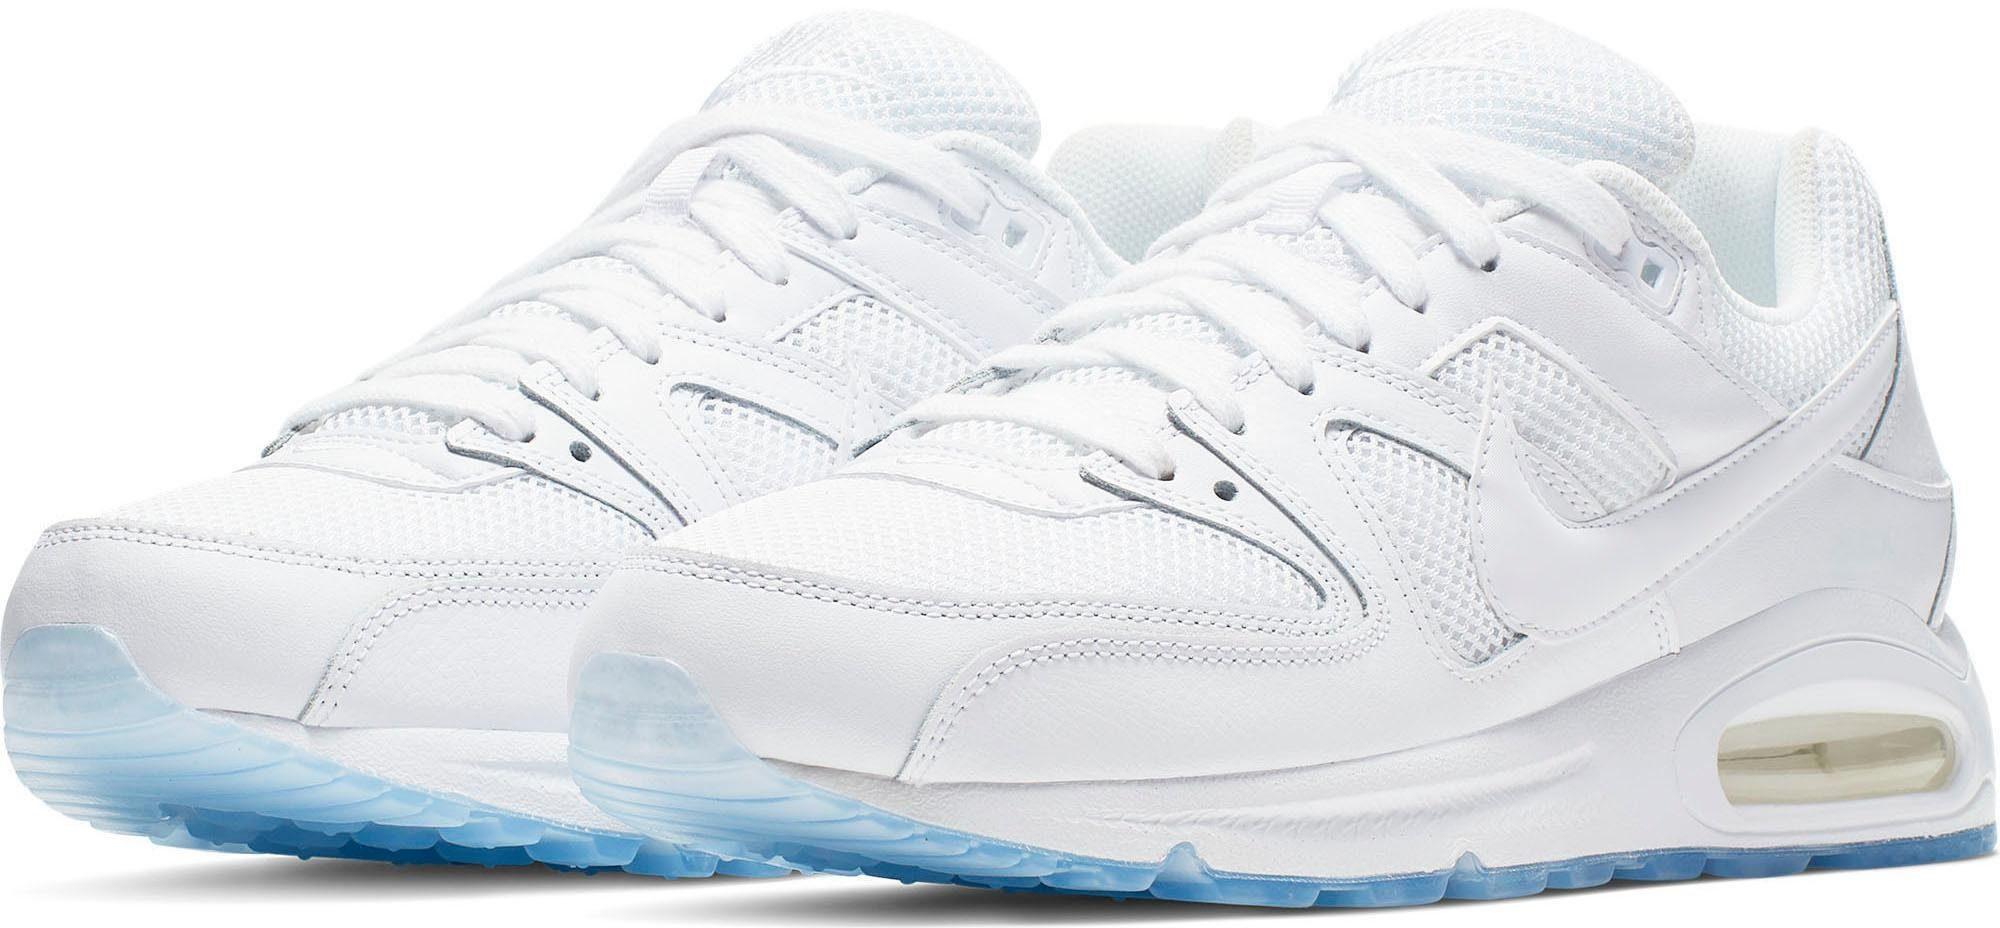 Nike Sportswear »Air Max Command« Sneaker kaufen | OTTO